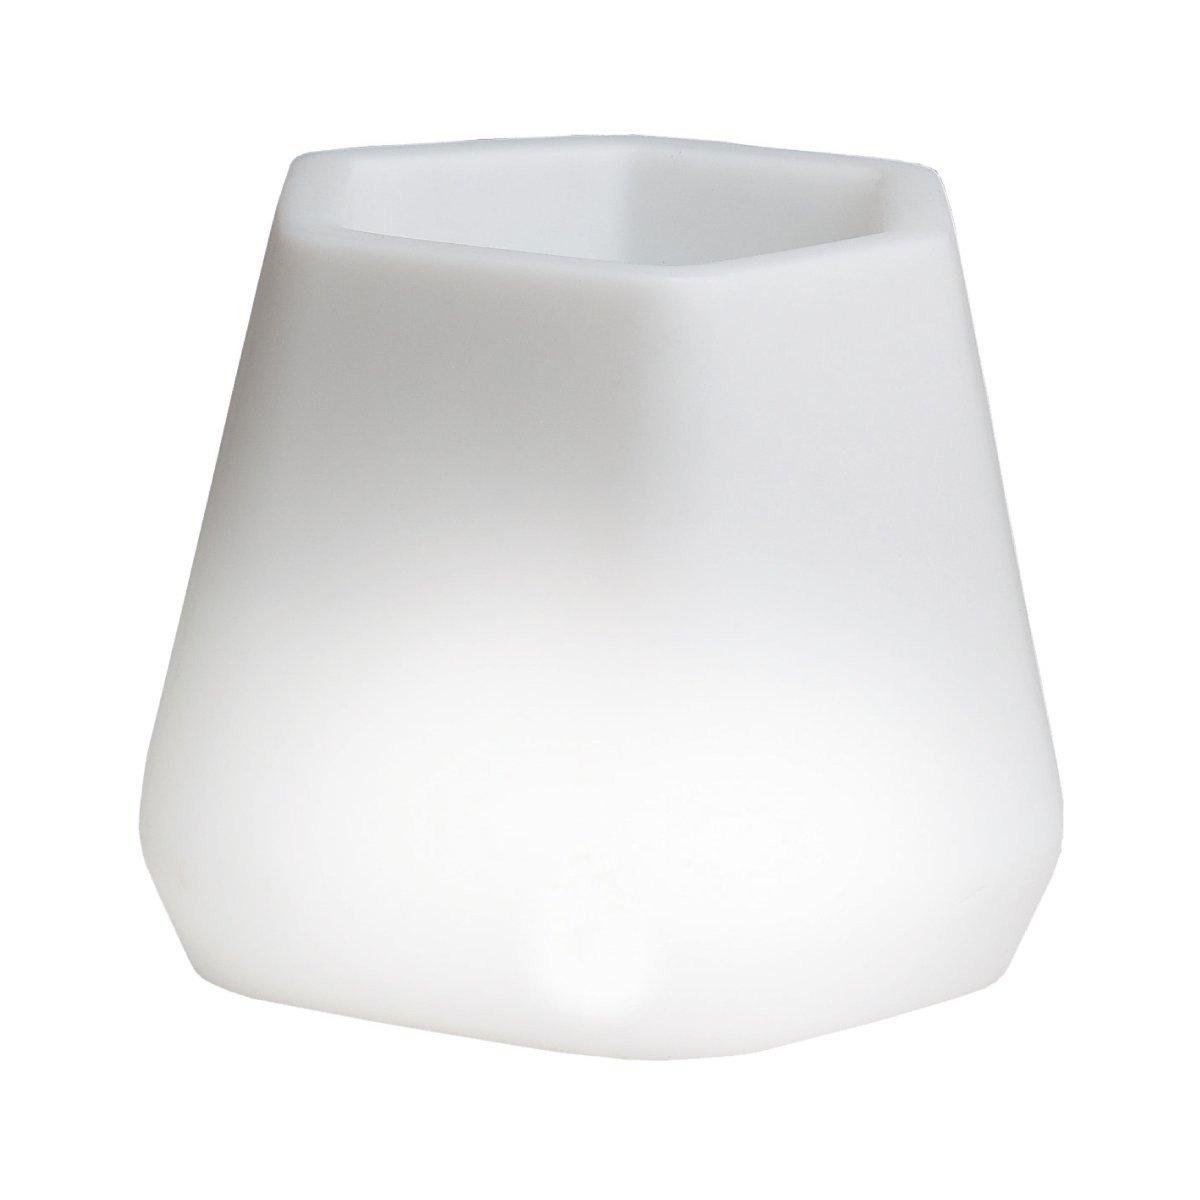 hydroflora 63005300 Nicoli LED-Leuchttopf OPS Small Light, weiß, 40 x 35 x 27 cm